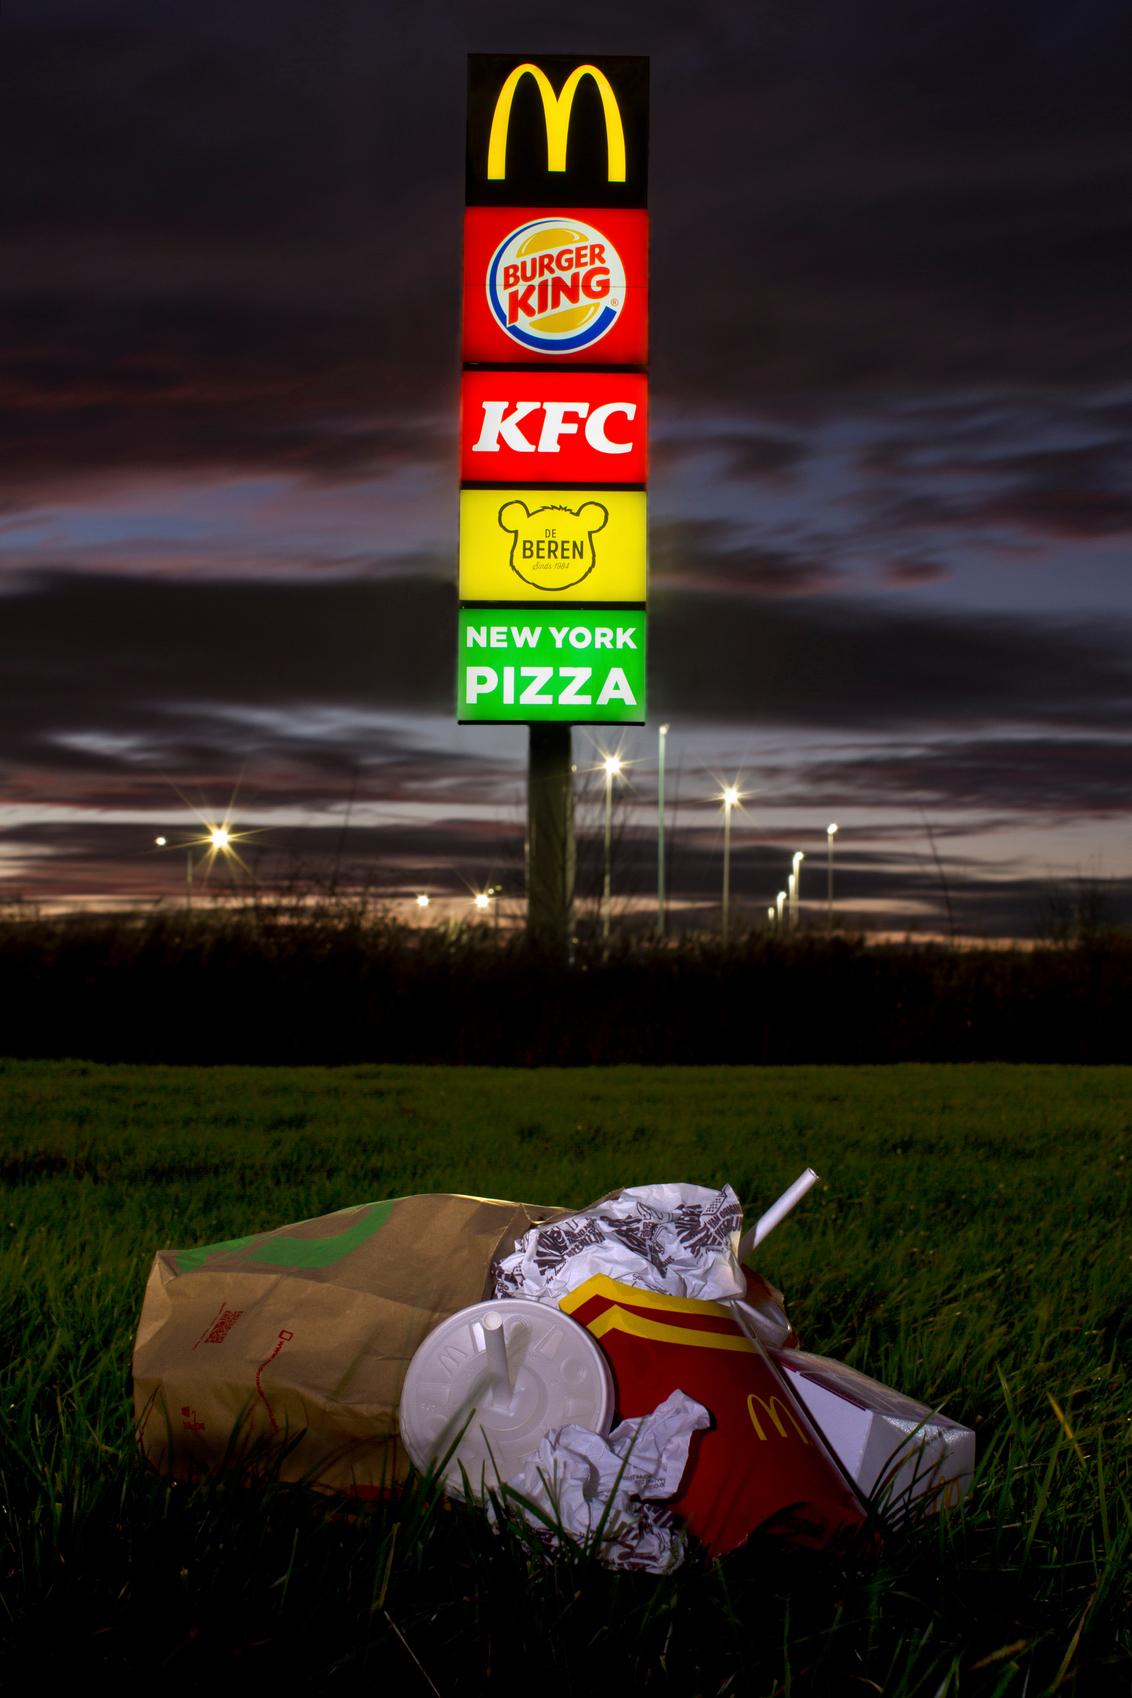 Fastfood - fastfood - foto door Mharinck op 24-12-2020 - deze foto bevat: donker, kleur, licht, avond, zonsondergang, kunst, nacht, nachtfotografie